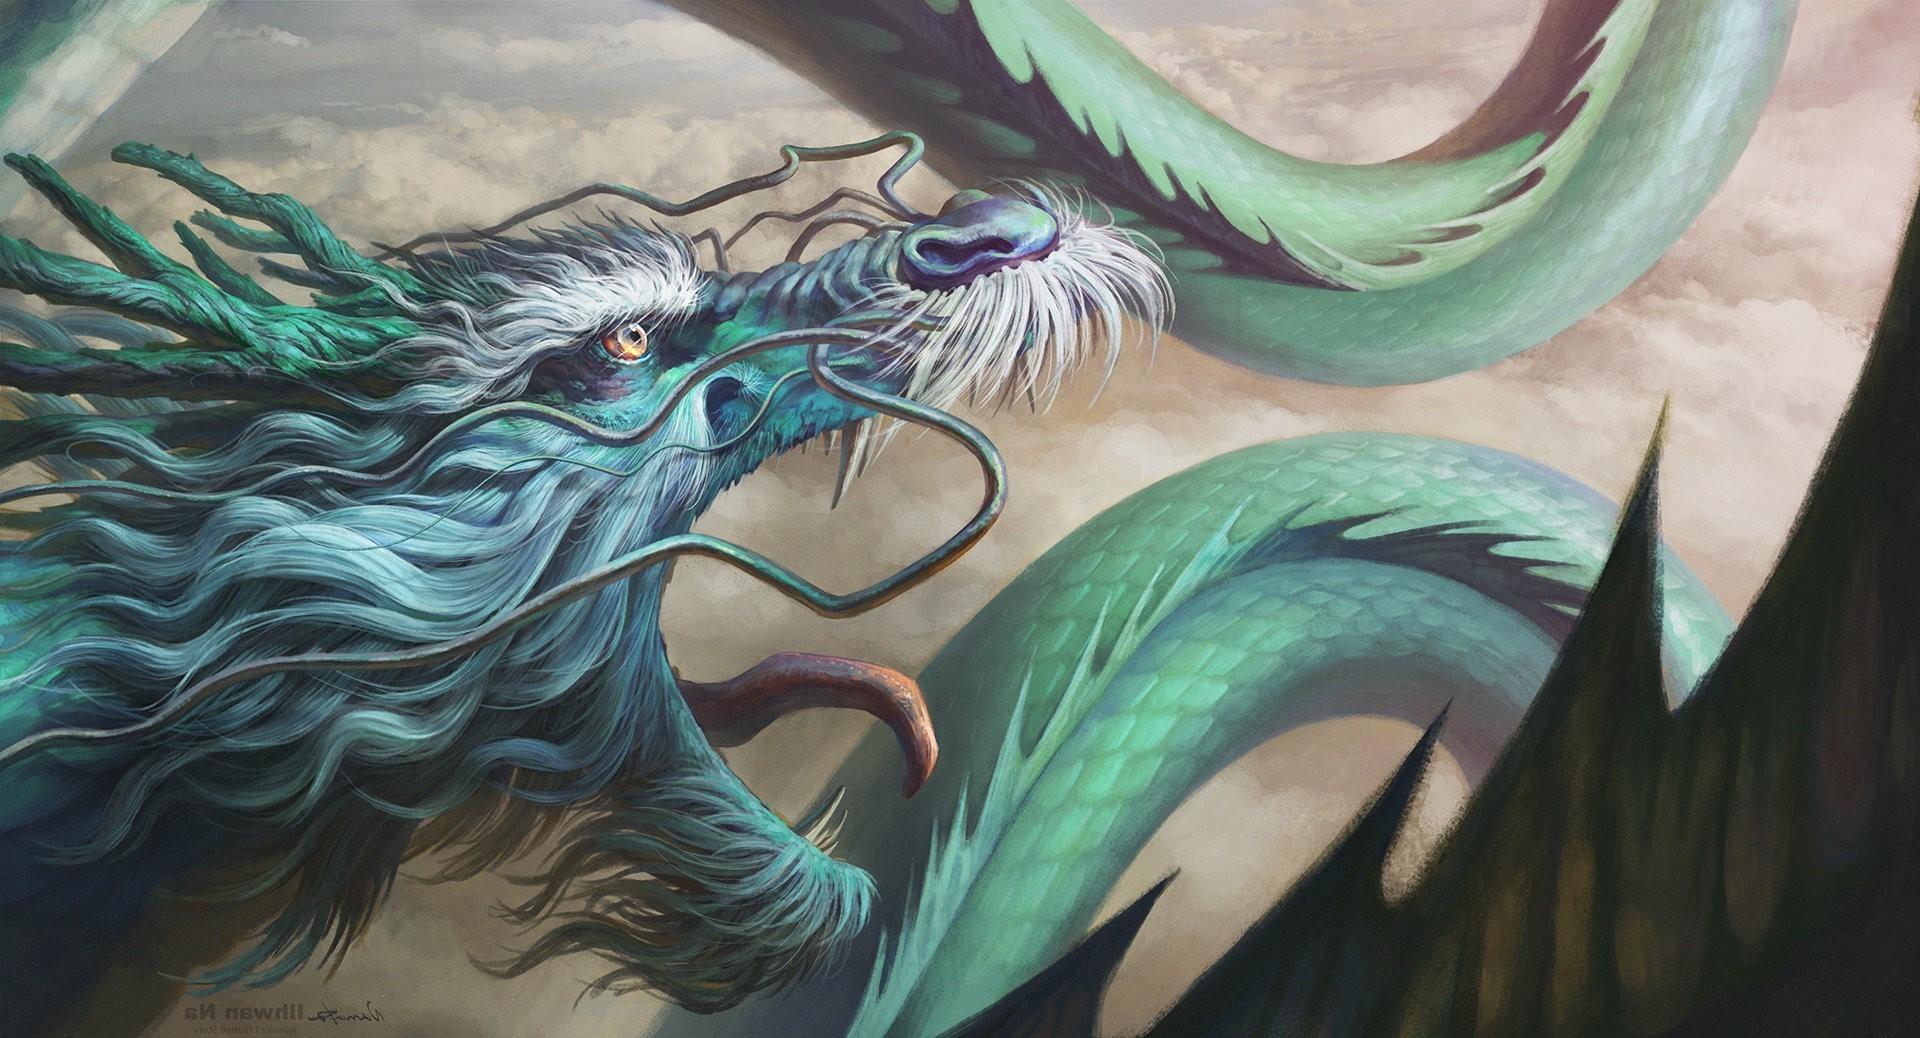 Wallpaper 1920x1038 Px Artwork Chinese Dragon Fantasy